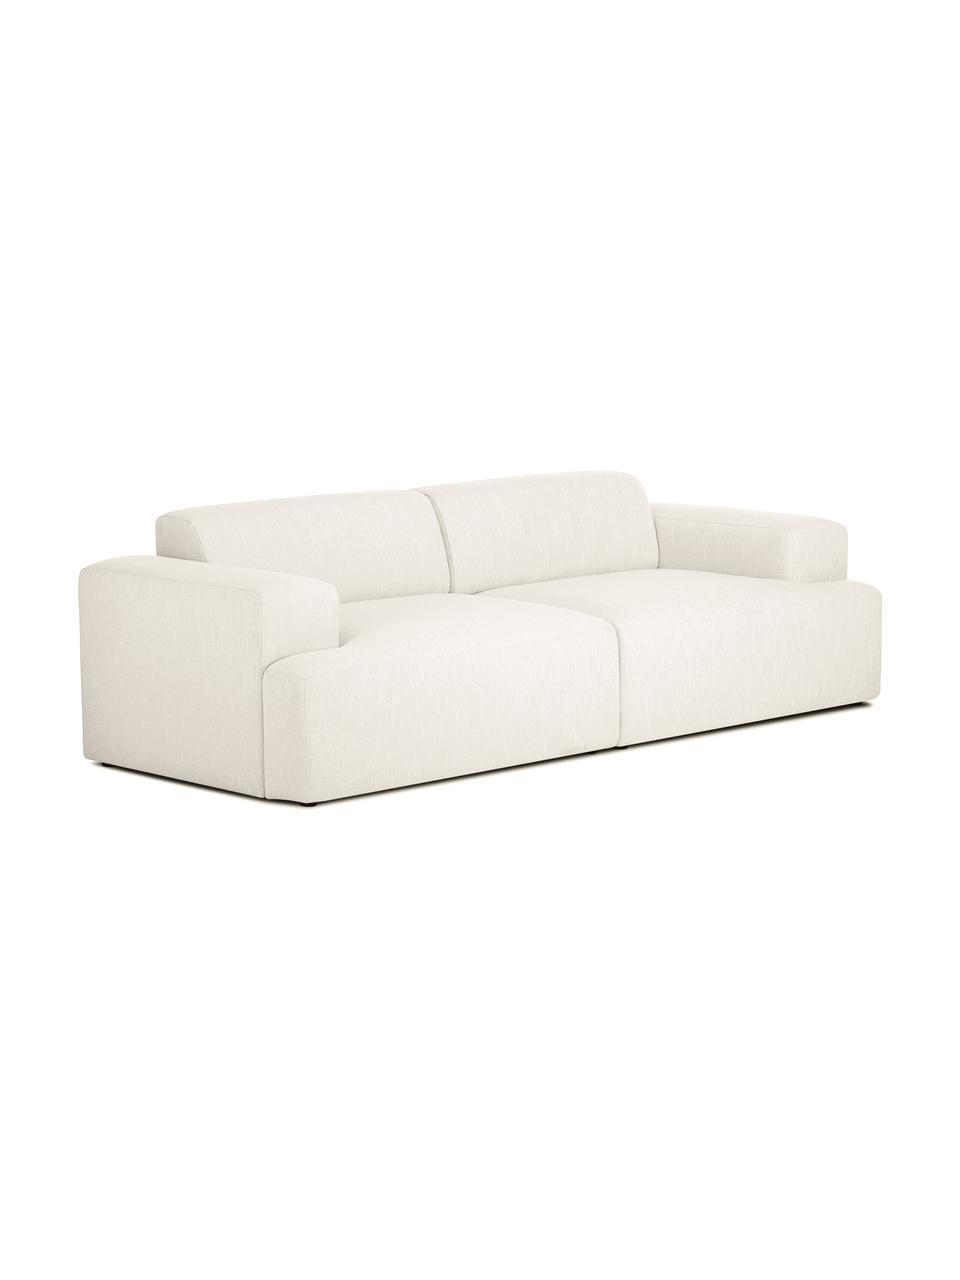 Sofa Melva (3-Sitzer) in Beige, Bezug: Polyester Der hochwertige, Gestell: Massives Kiefernholz, Spa, Füße: Kiefernholz, Webstoff Beige, B 240 x T 101 cm